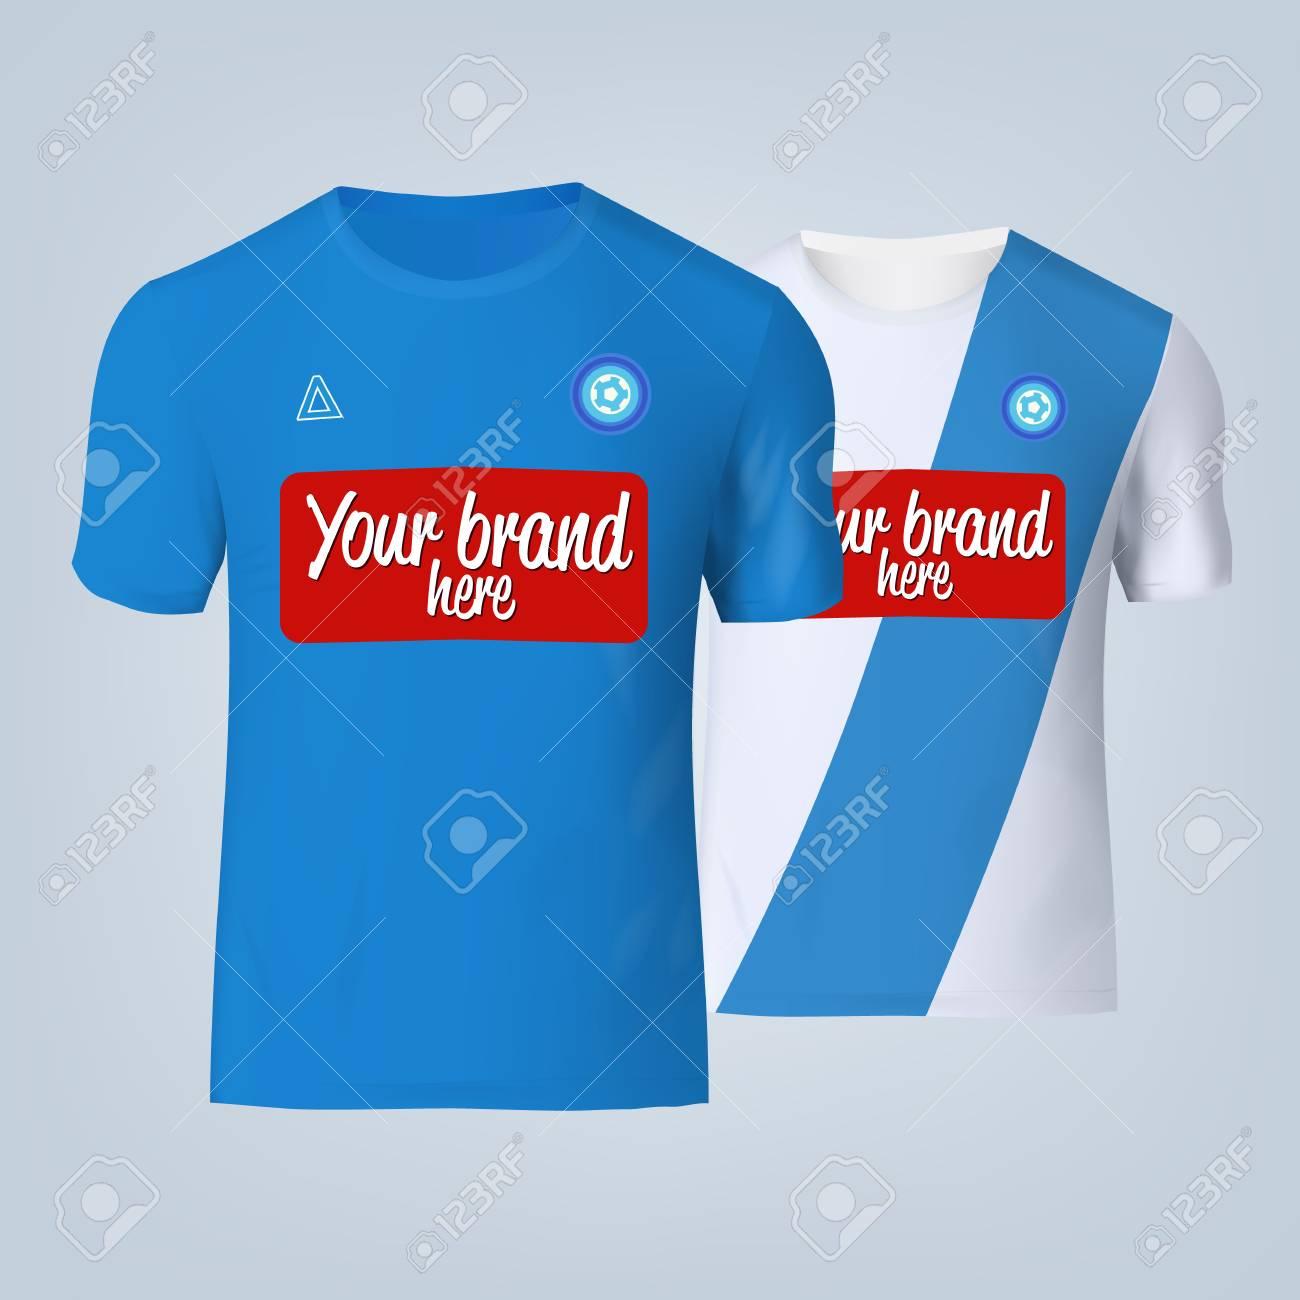 Vector illustration of football t-shirt template. - 84013133